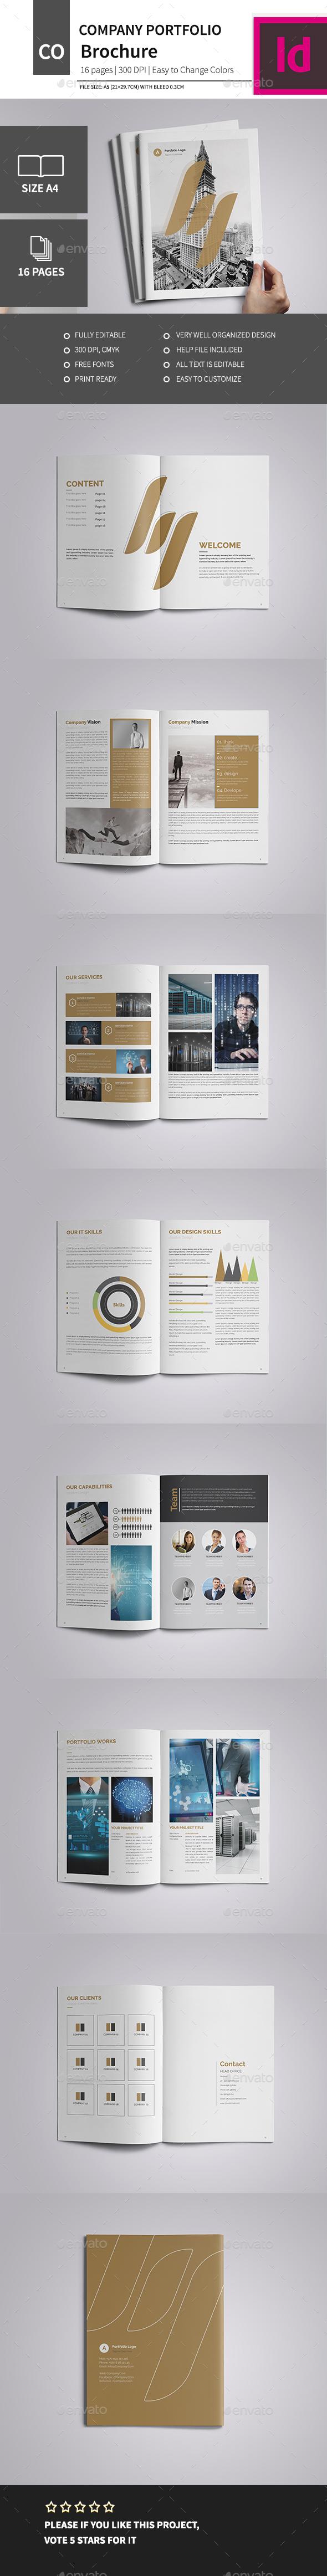 A4 Corporate Business Brochure 2016 - Corporate Brochures